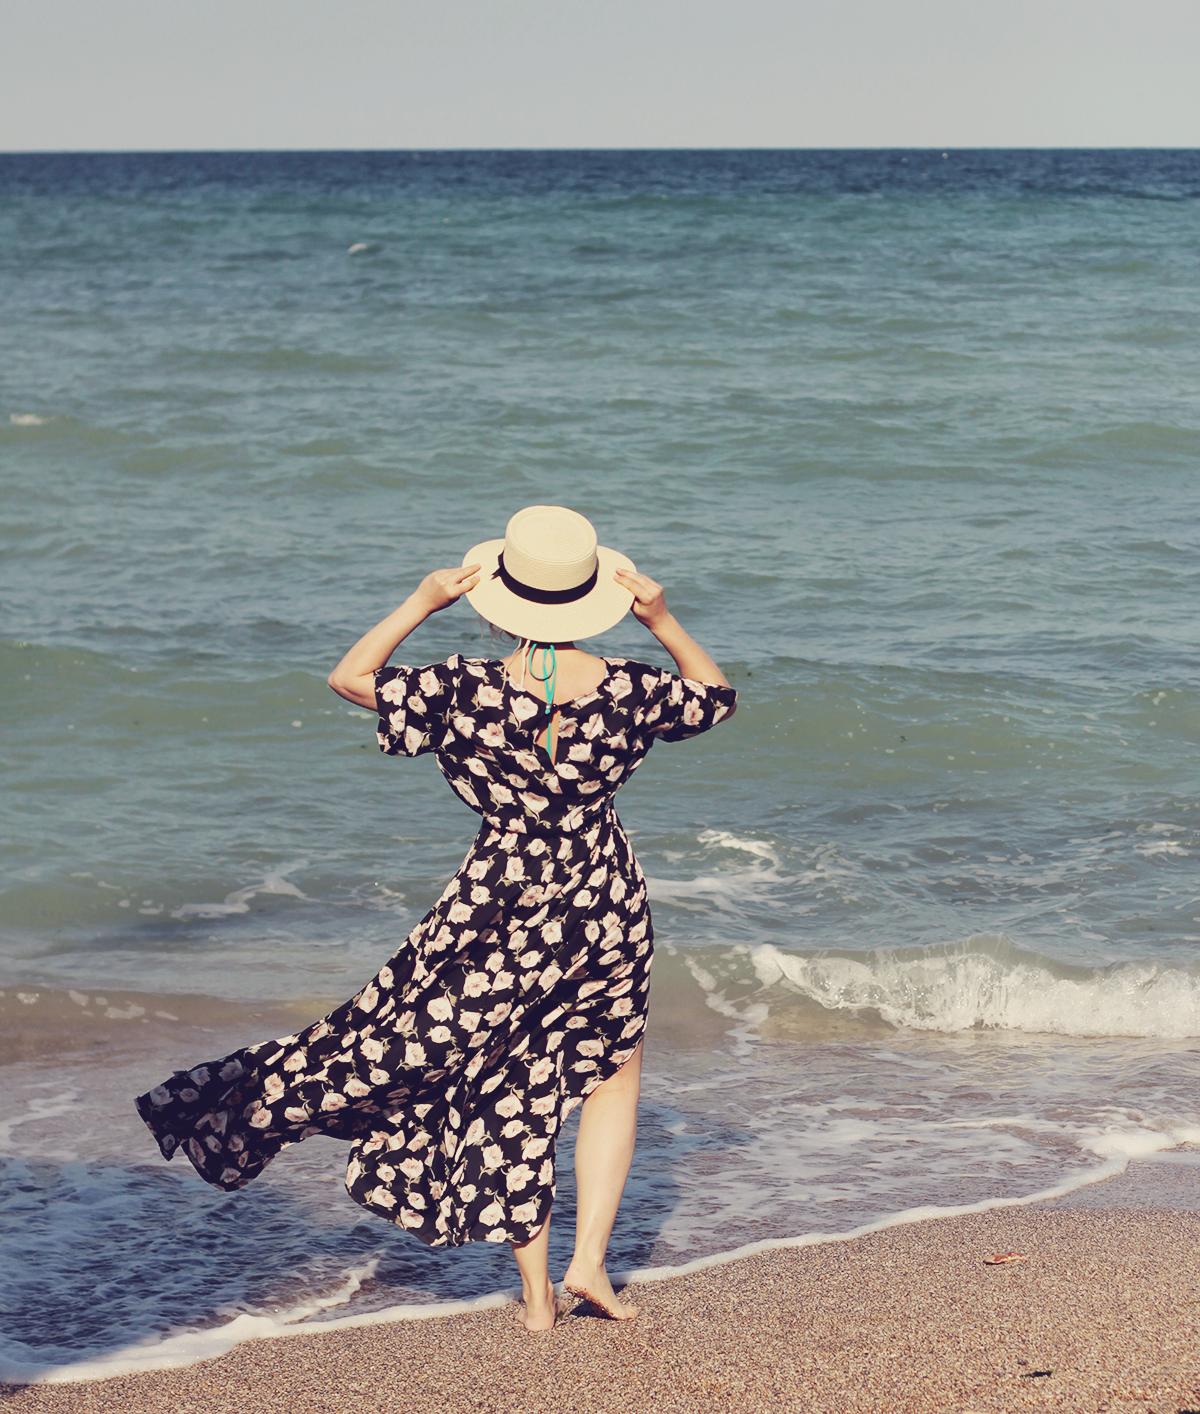 zaful floral maxi dress, vama veche, beachside, straw hat